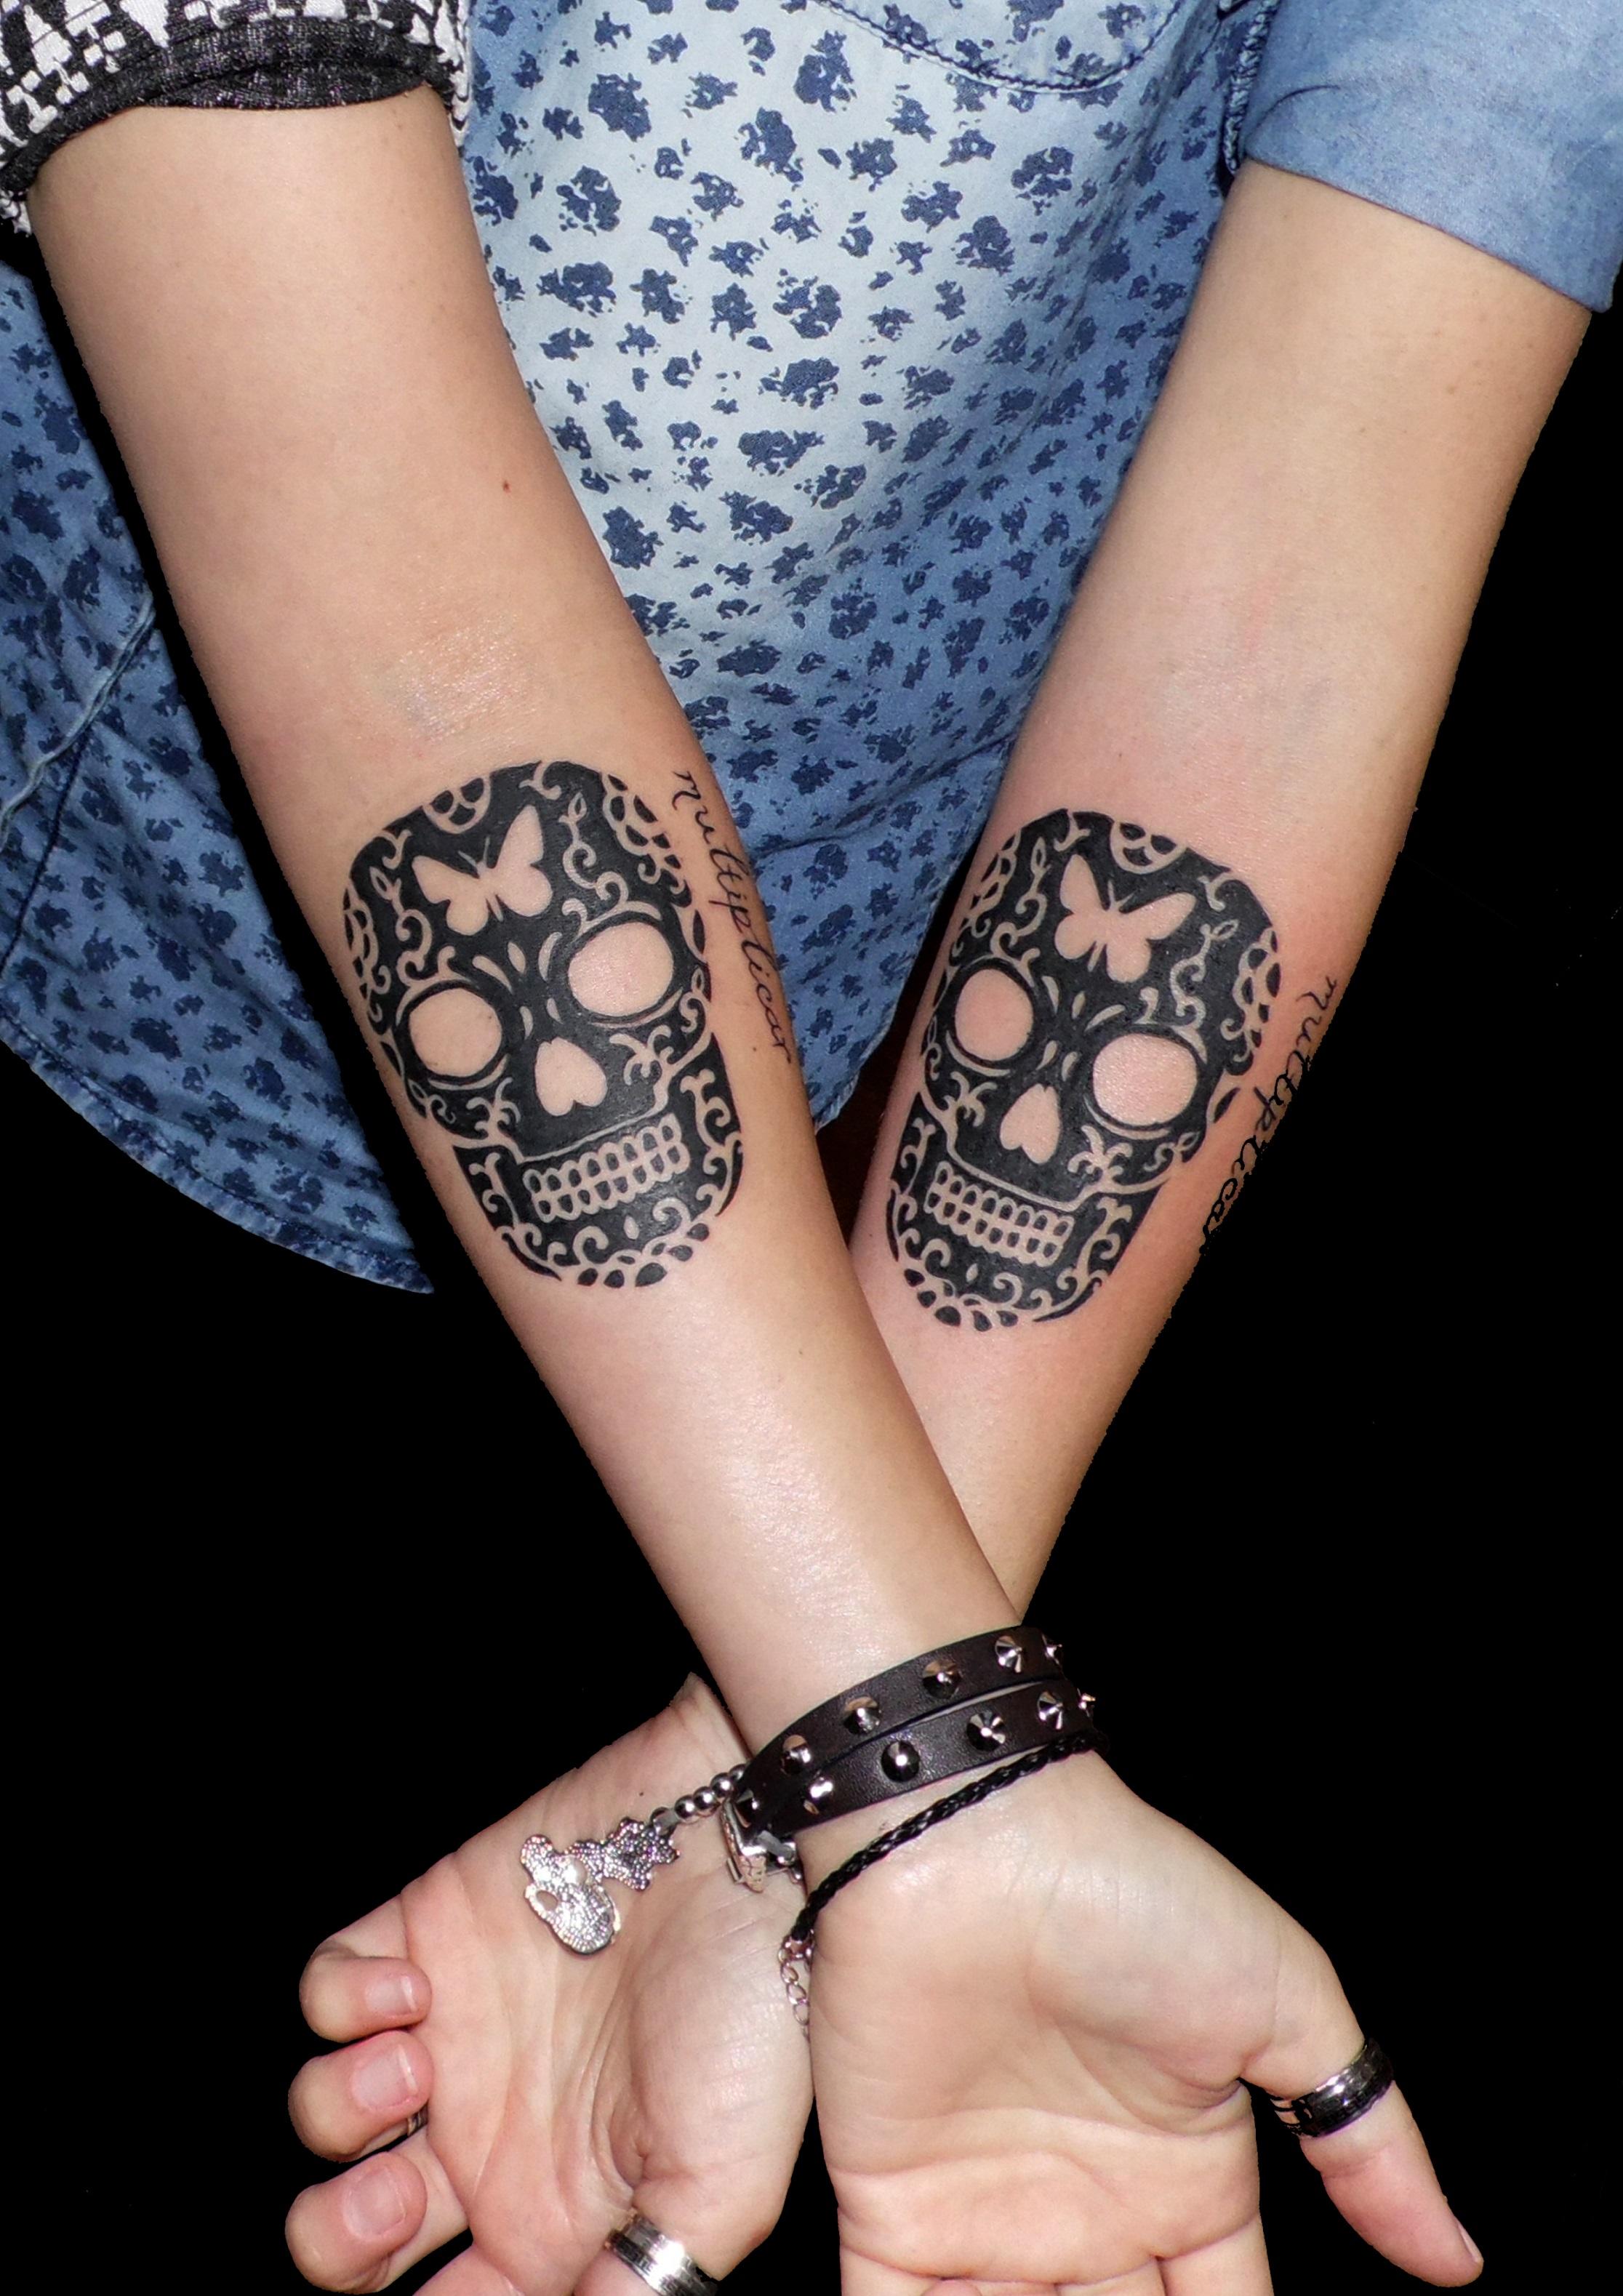 Imágenes Tatuajes 13depicascomstudio Tattoopiercingshop